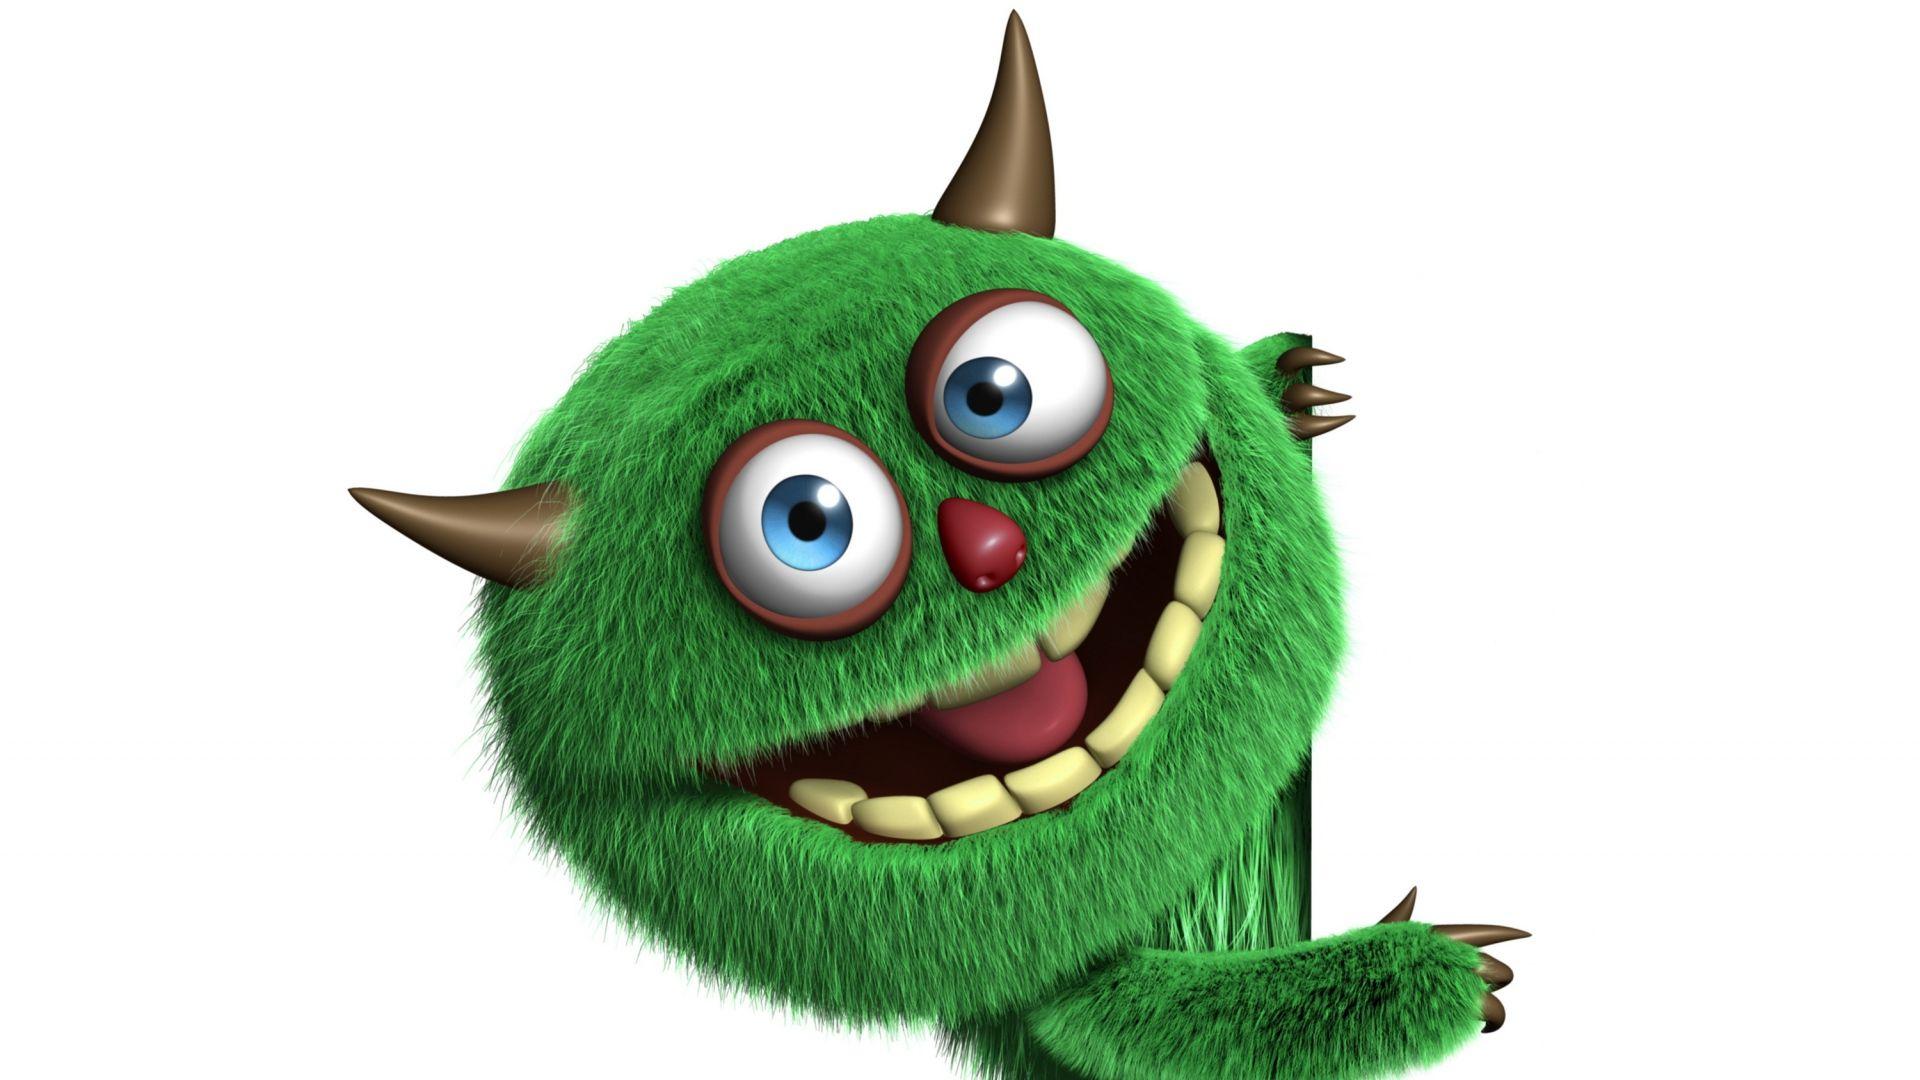 latest 3d monster cute funny furry wallpaper image wallpaper   3d